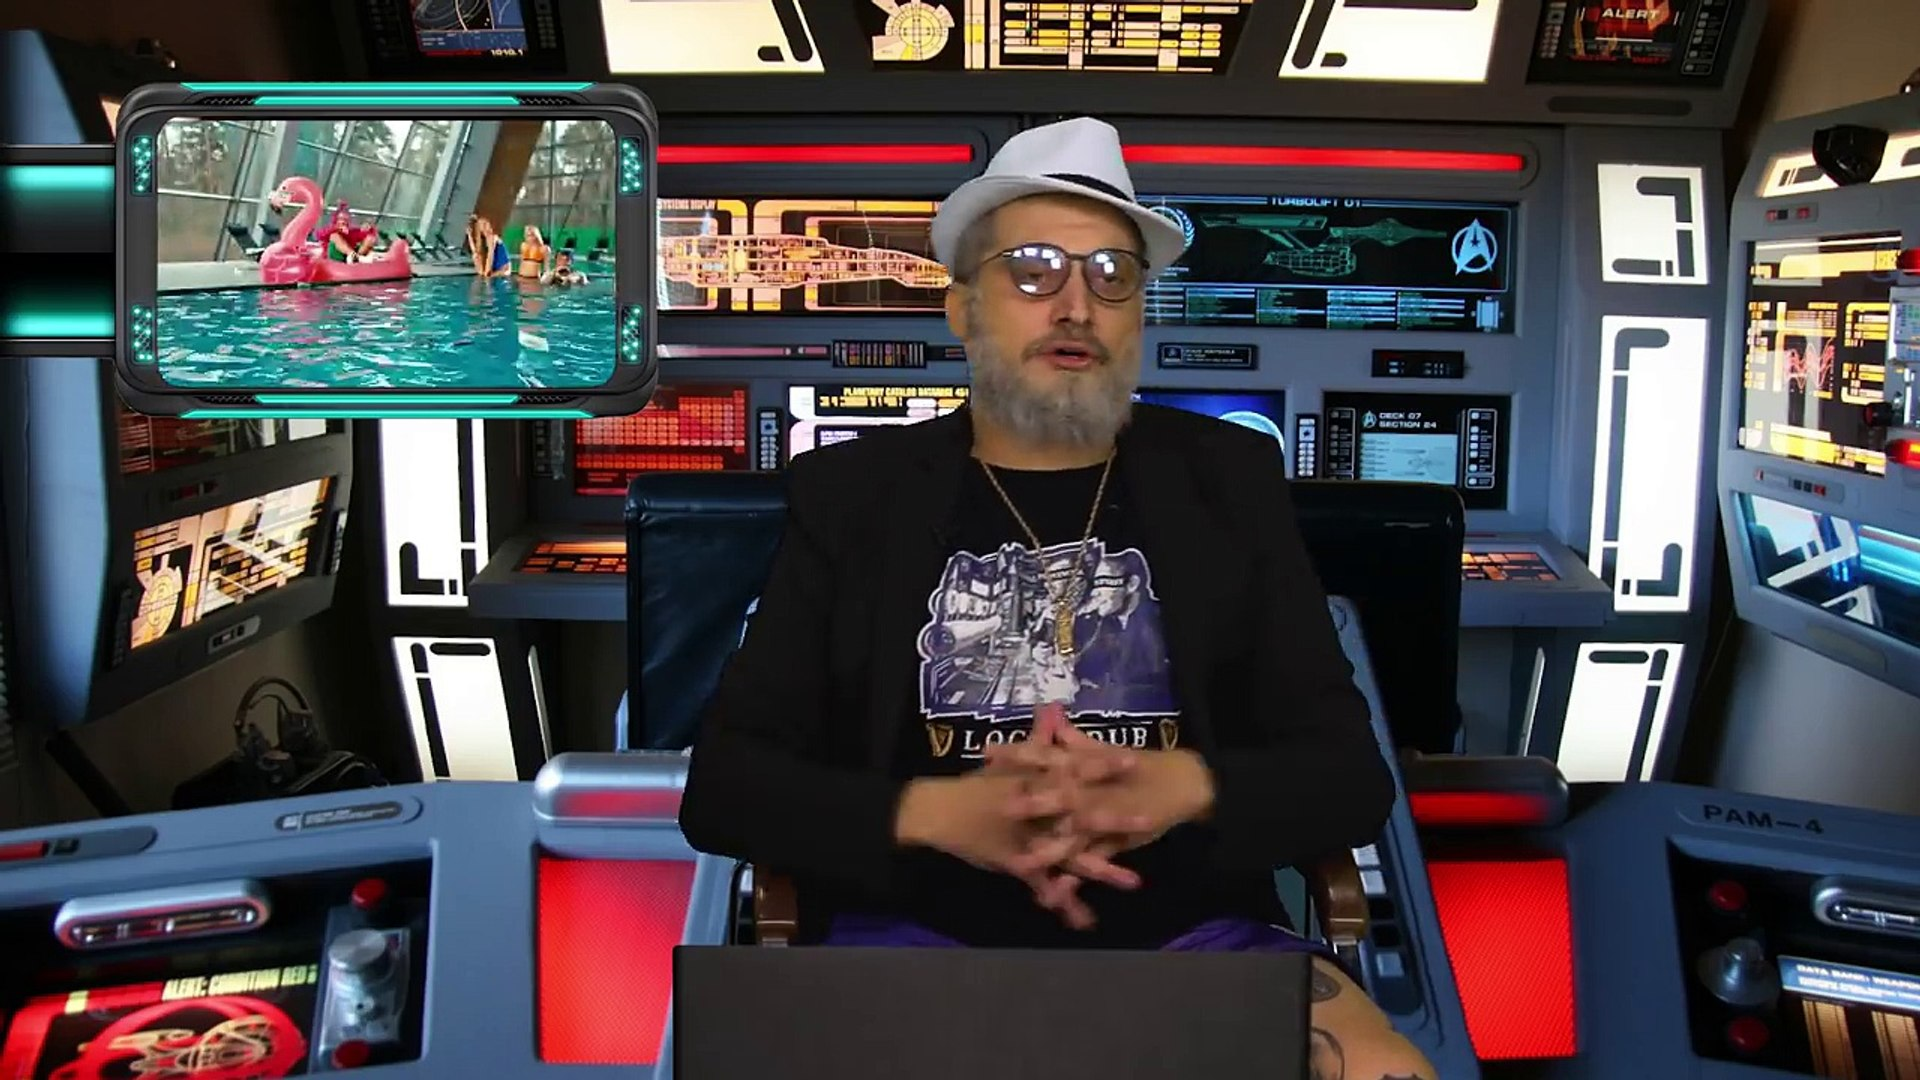 Паша Техник #2048: Реакция на Тимати feat. Егор Крид, Pharaoh, Пошлая Молли